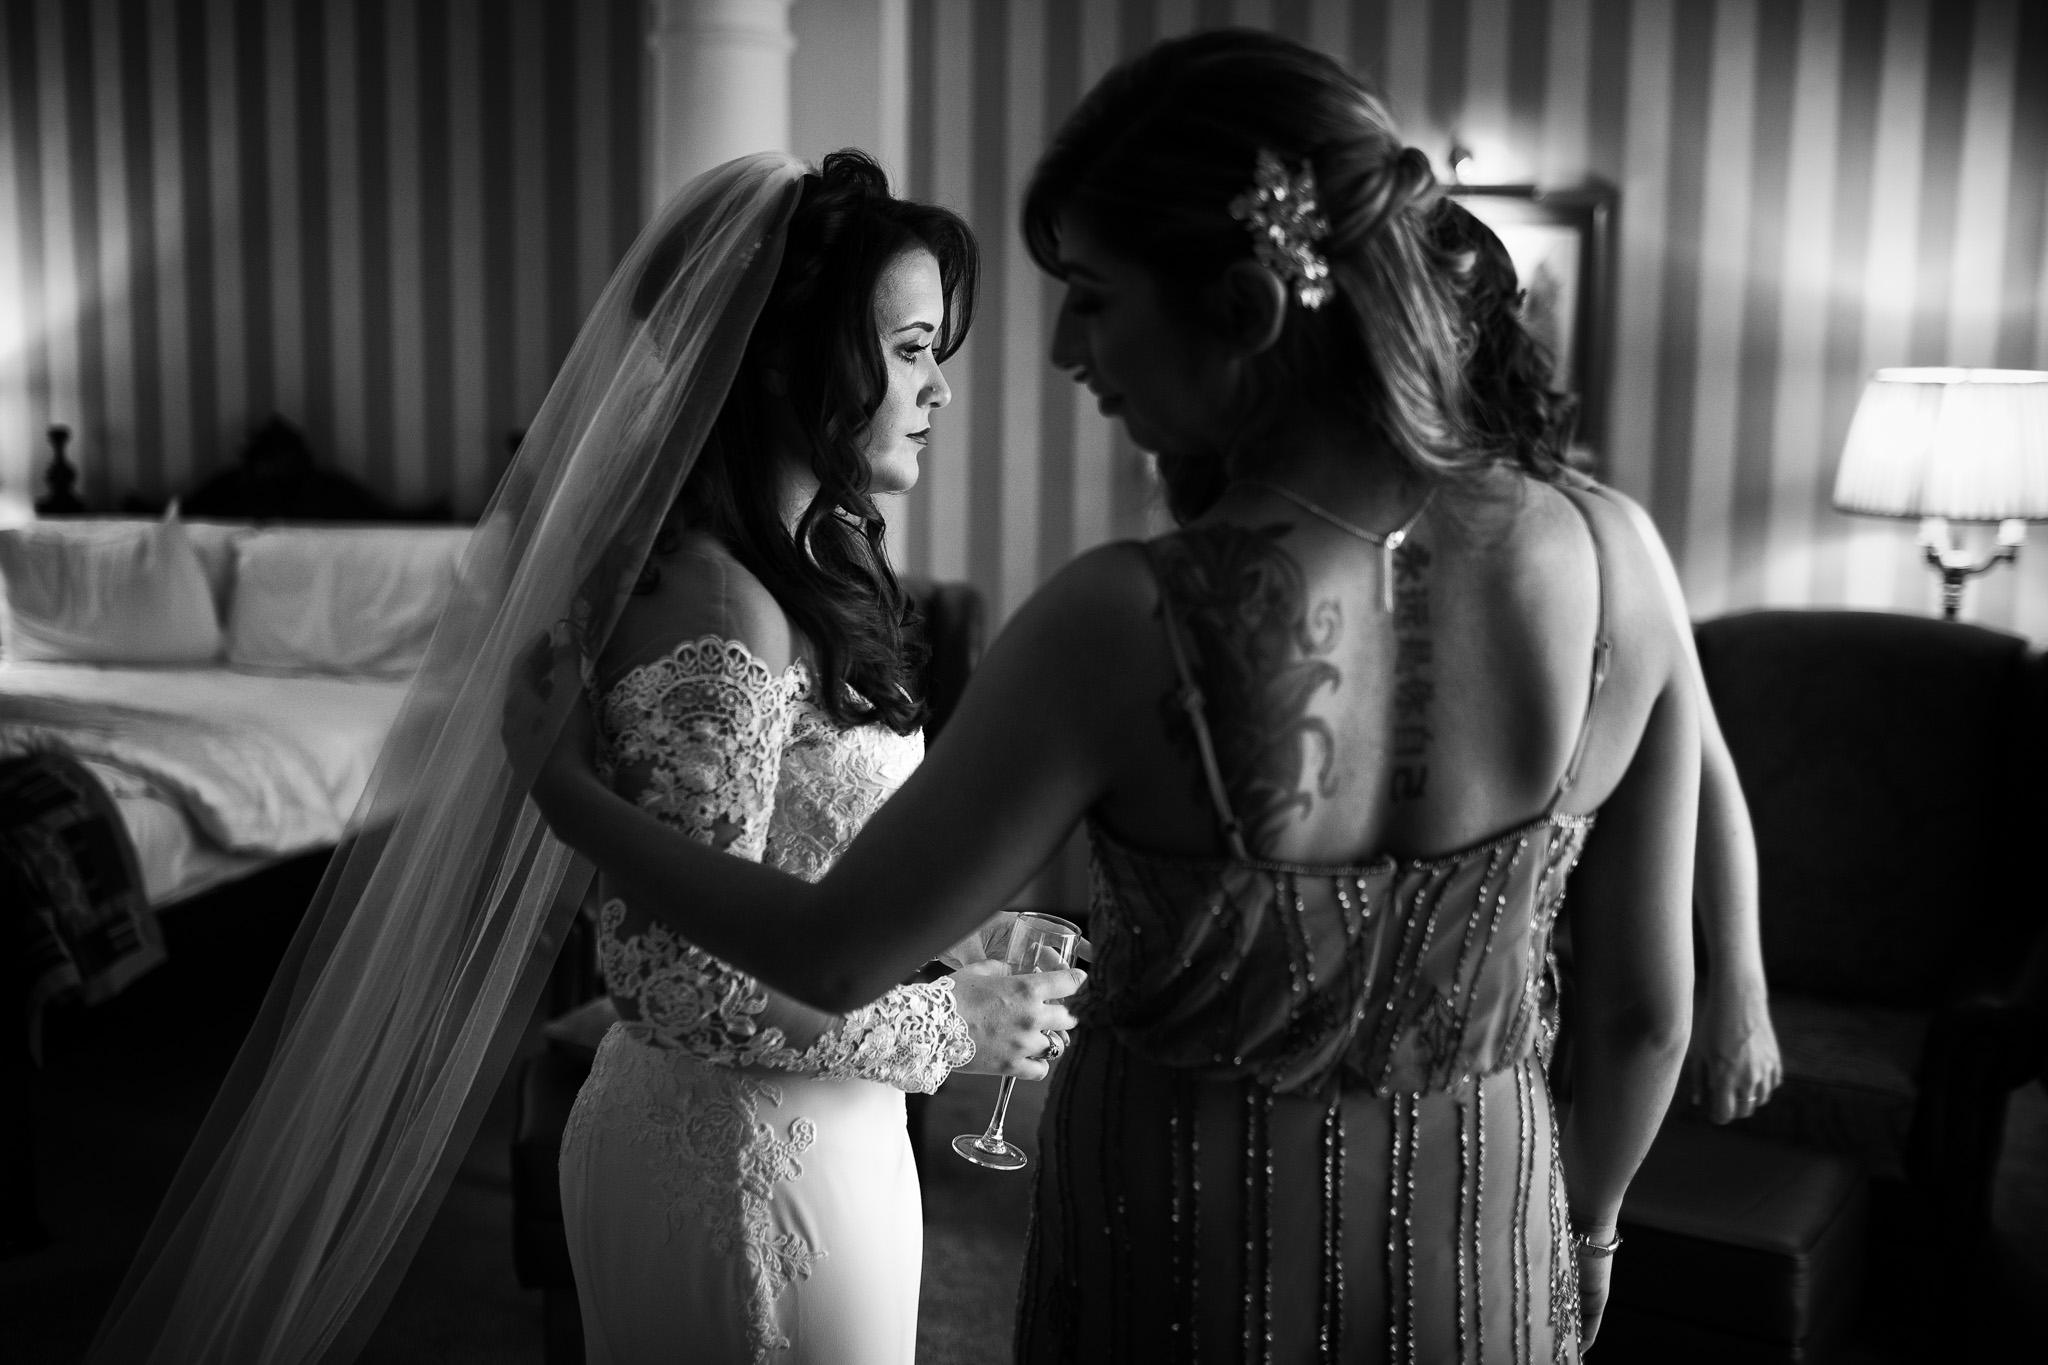 Mark_Barnes_Northern_Ireland_wedding_photographer_Harveys_Point_Donegall_Wedding_photography-Adam&Gemma-10.jpg